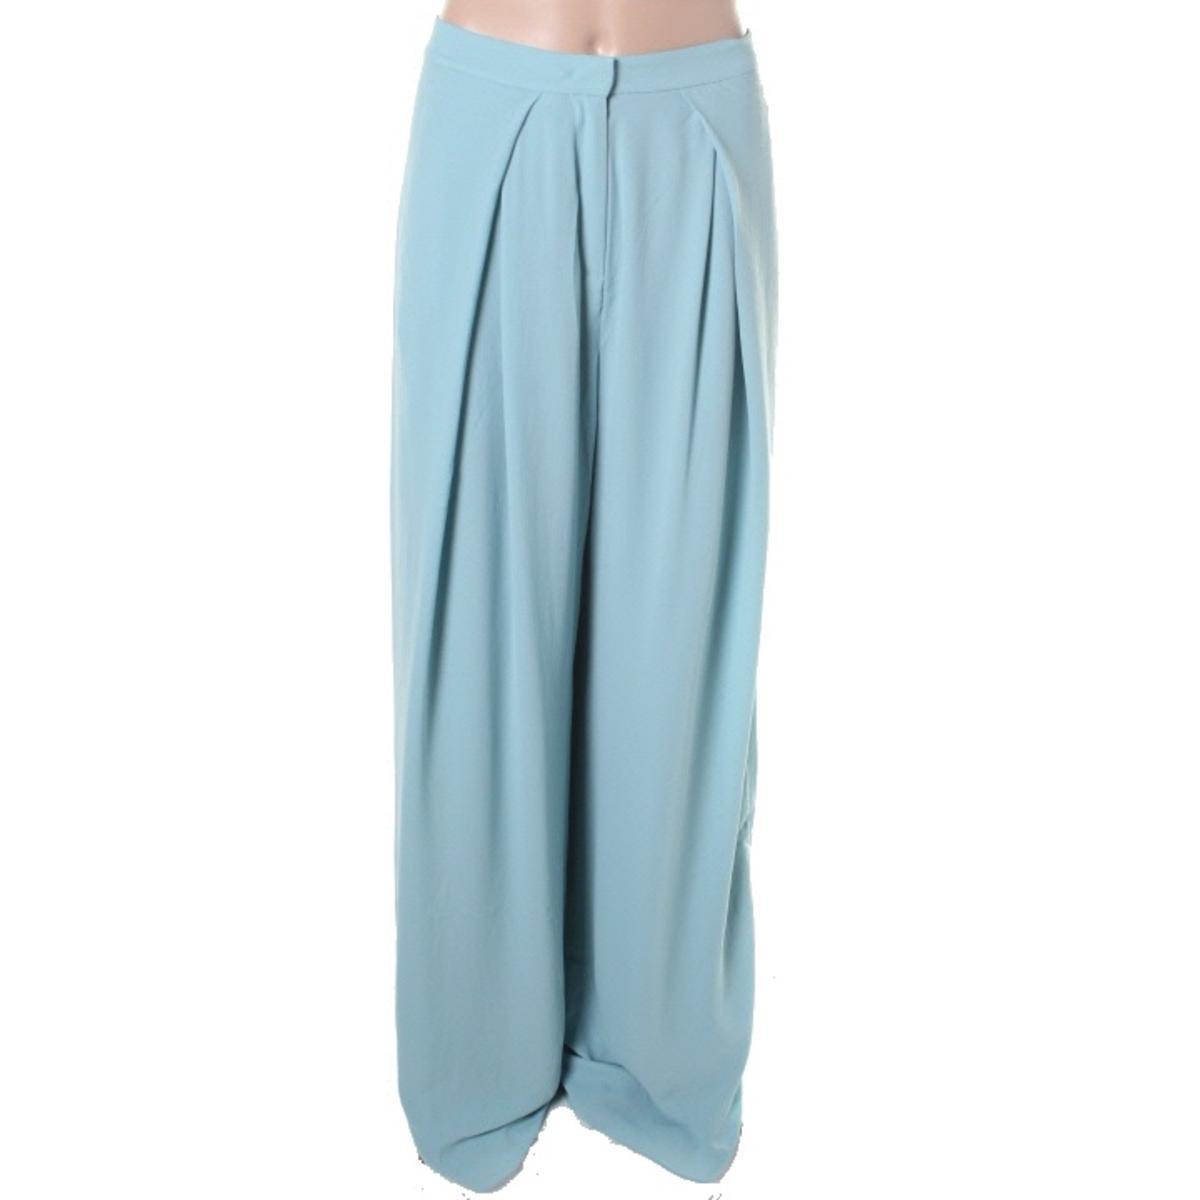 Best Dress Pants For The Money